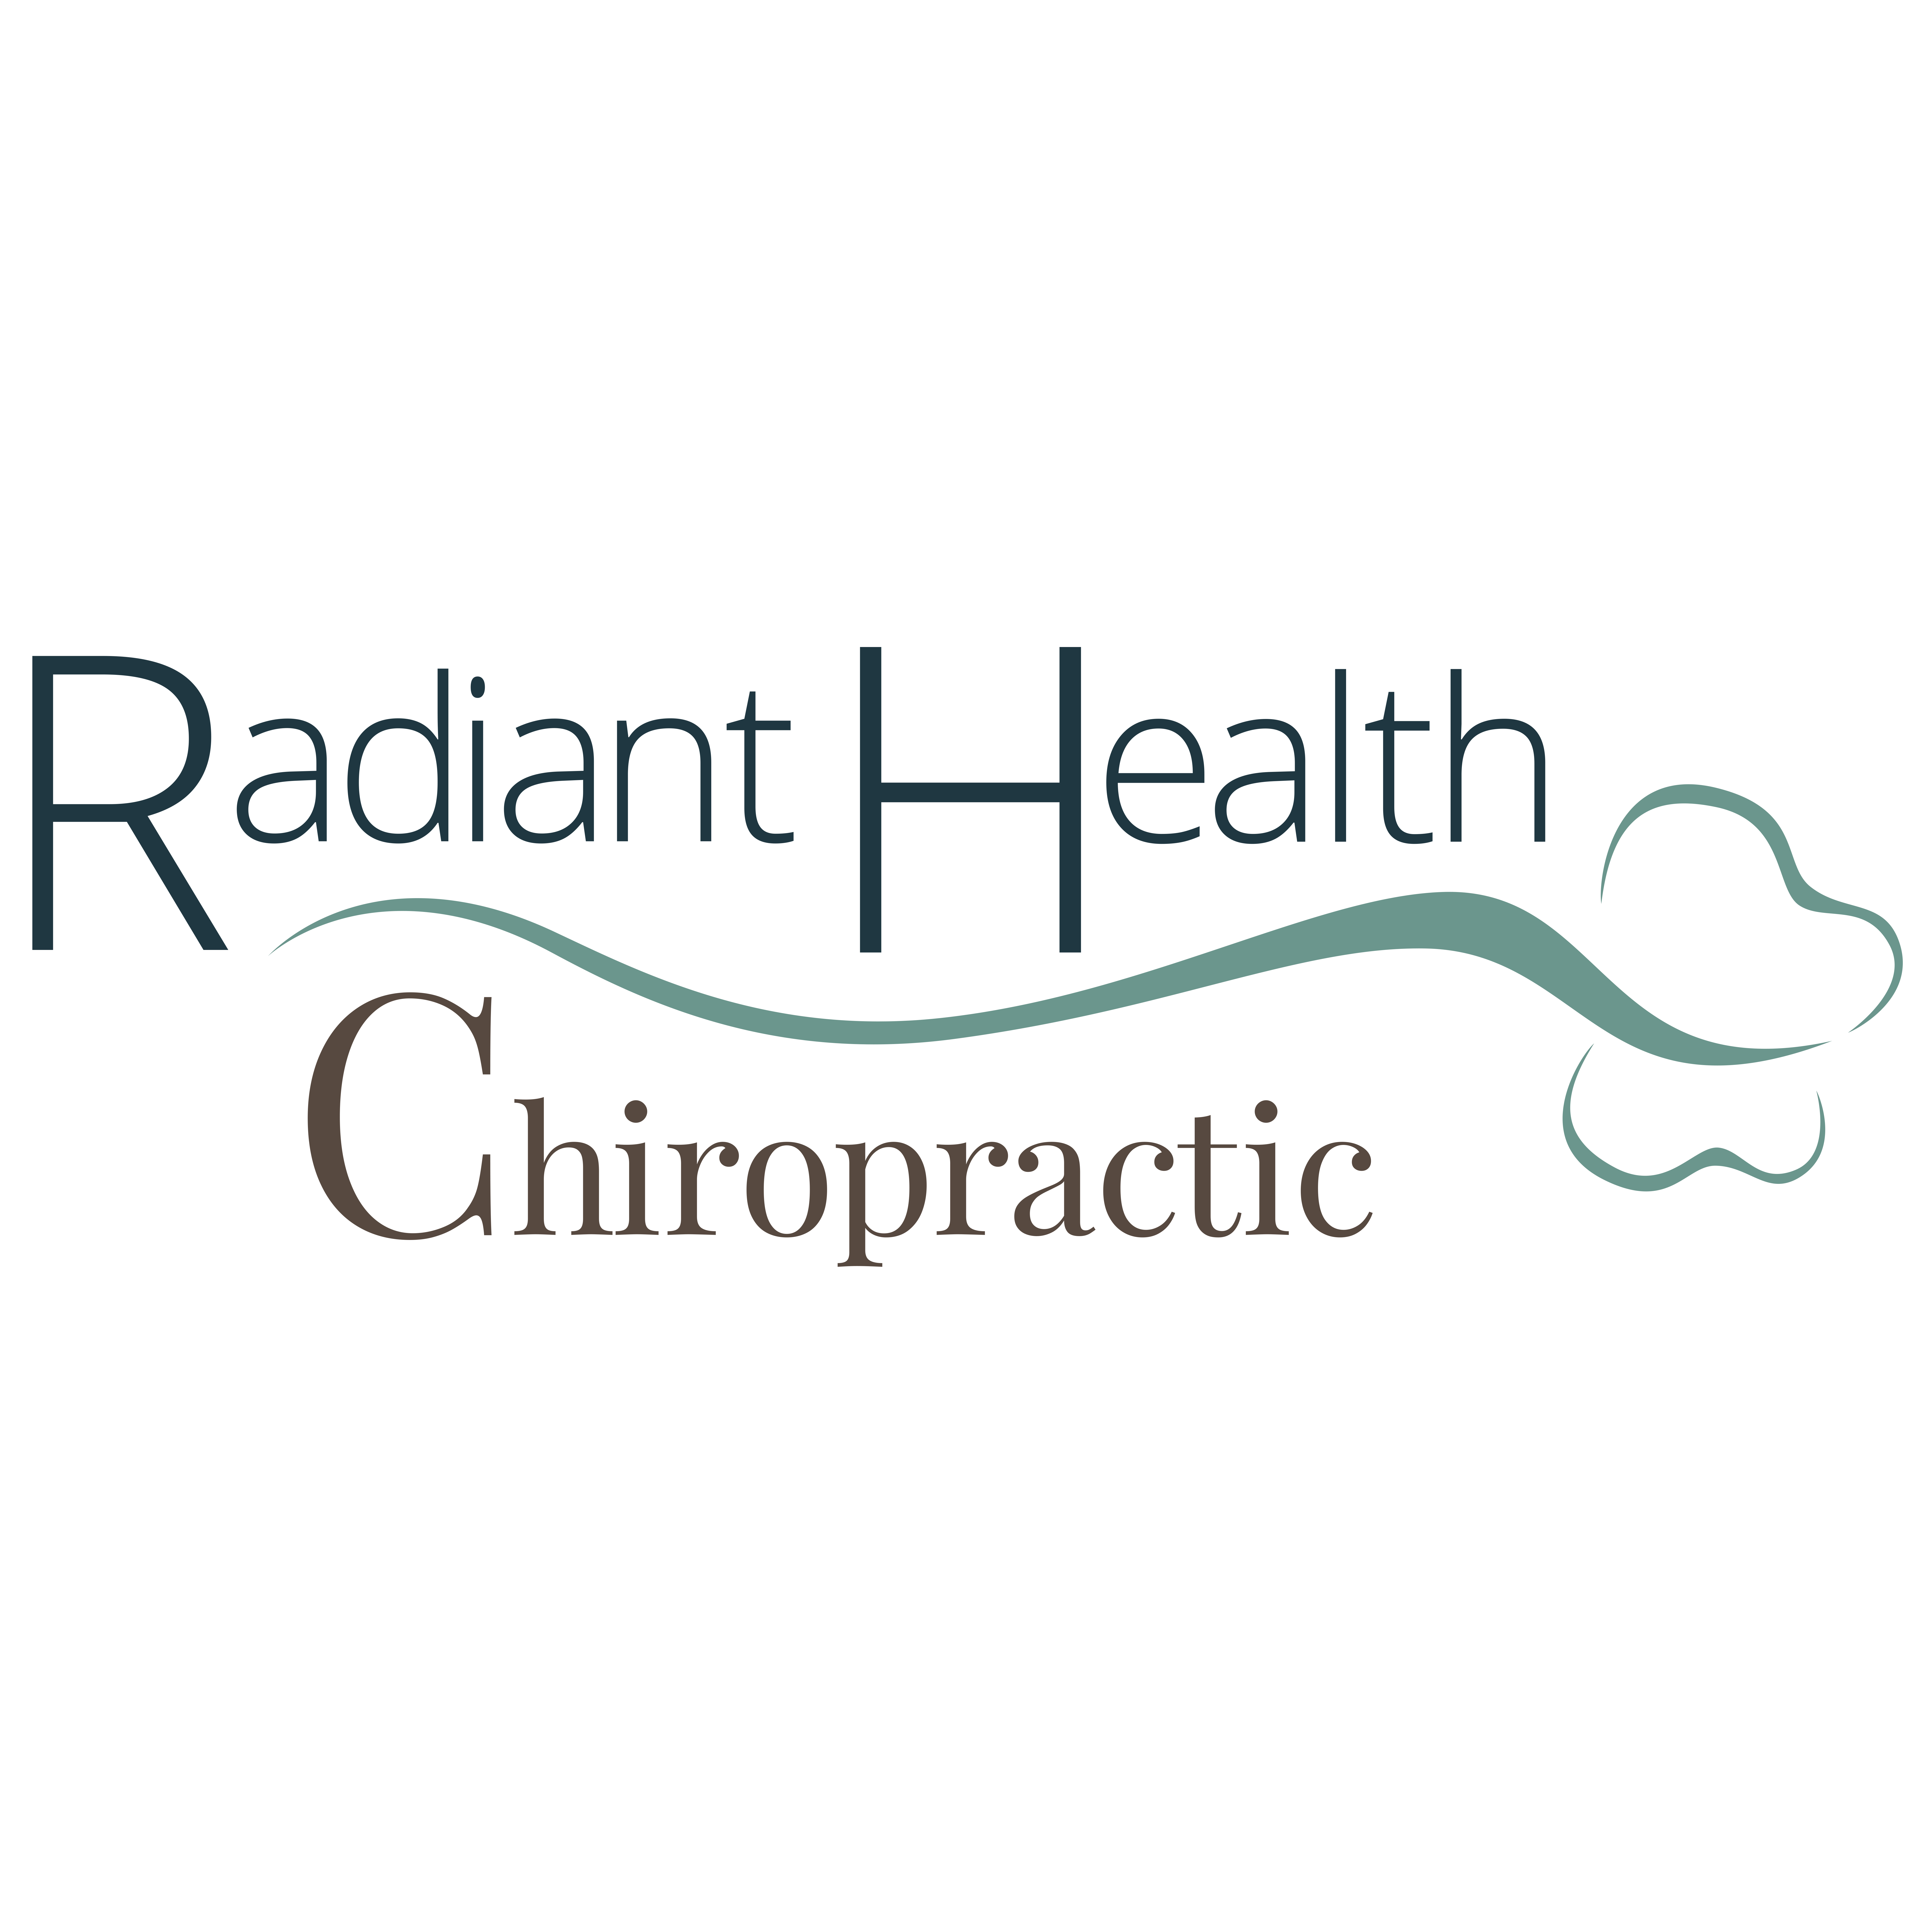 Radiant Health Chiropractic